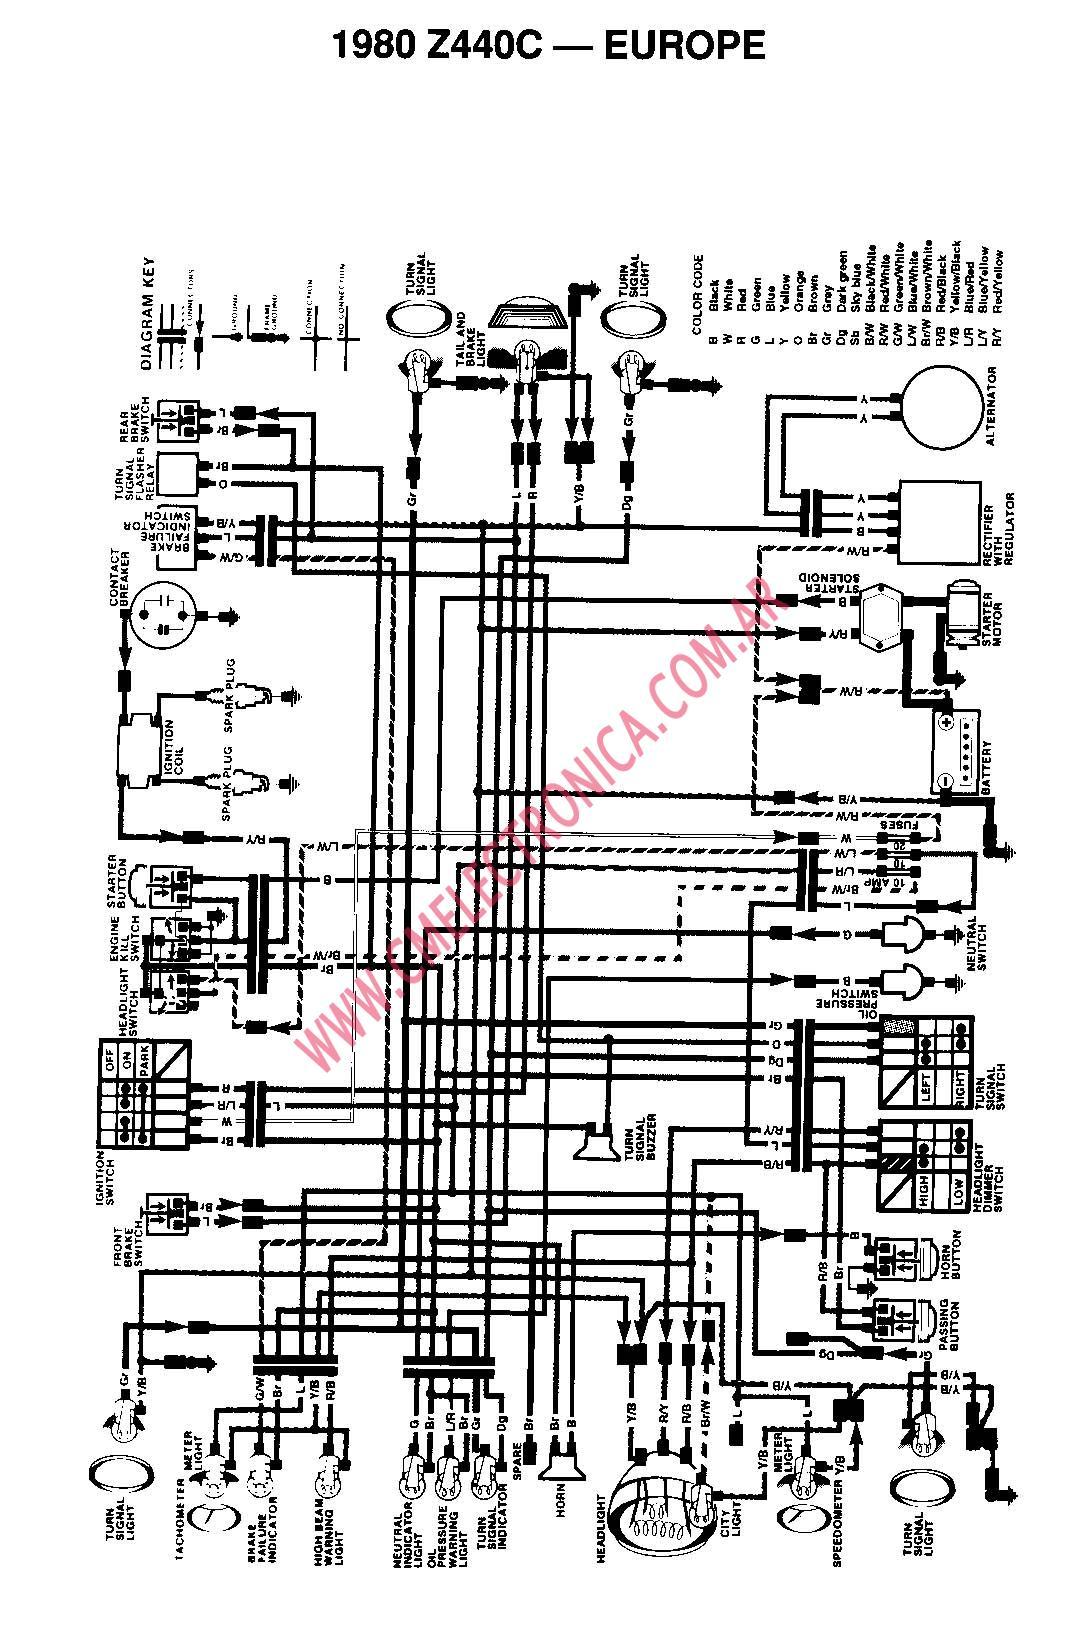 M113a3 Starter Wire Diagram Car Fuse Box Wiring Small Block Chevy Kawasaki Bayou 250 Rh Ashleylauren Co